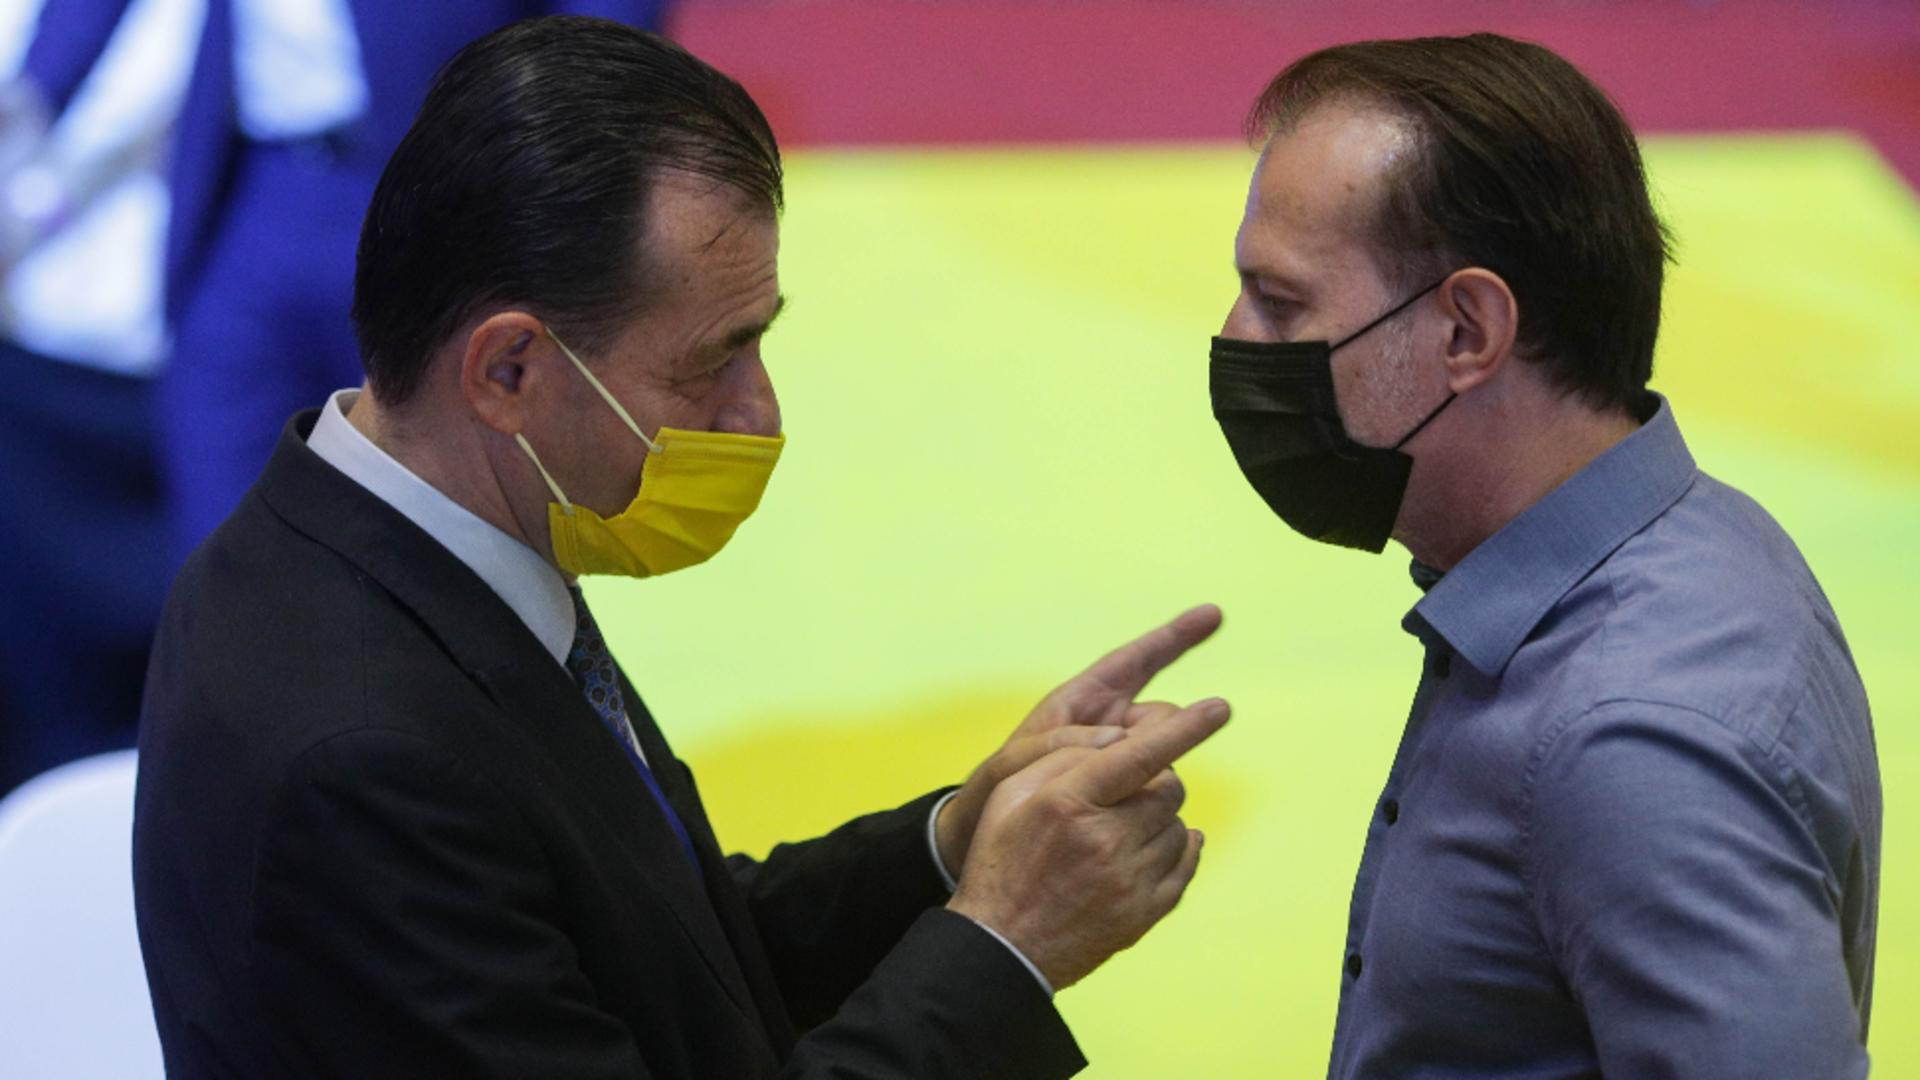 Ludovic Orban și Florin Cîțu. Foto: Inquam / Octav Ganea